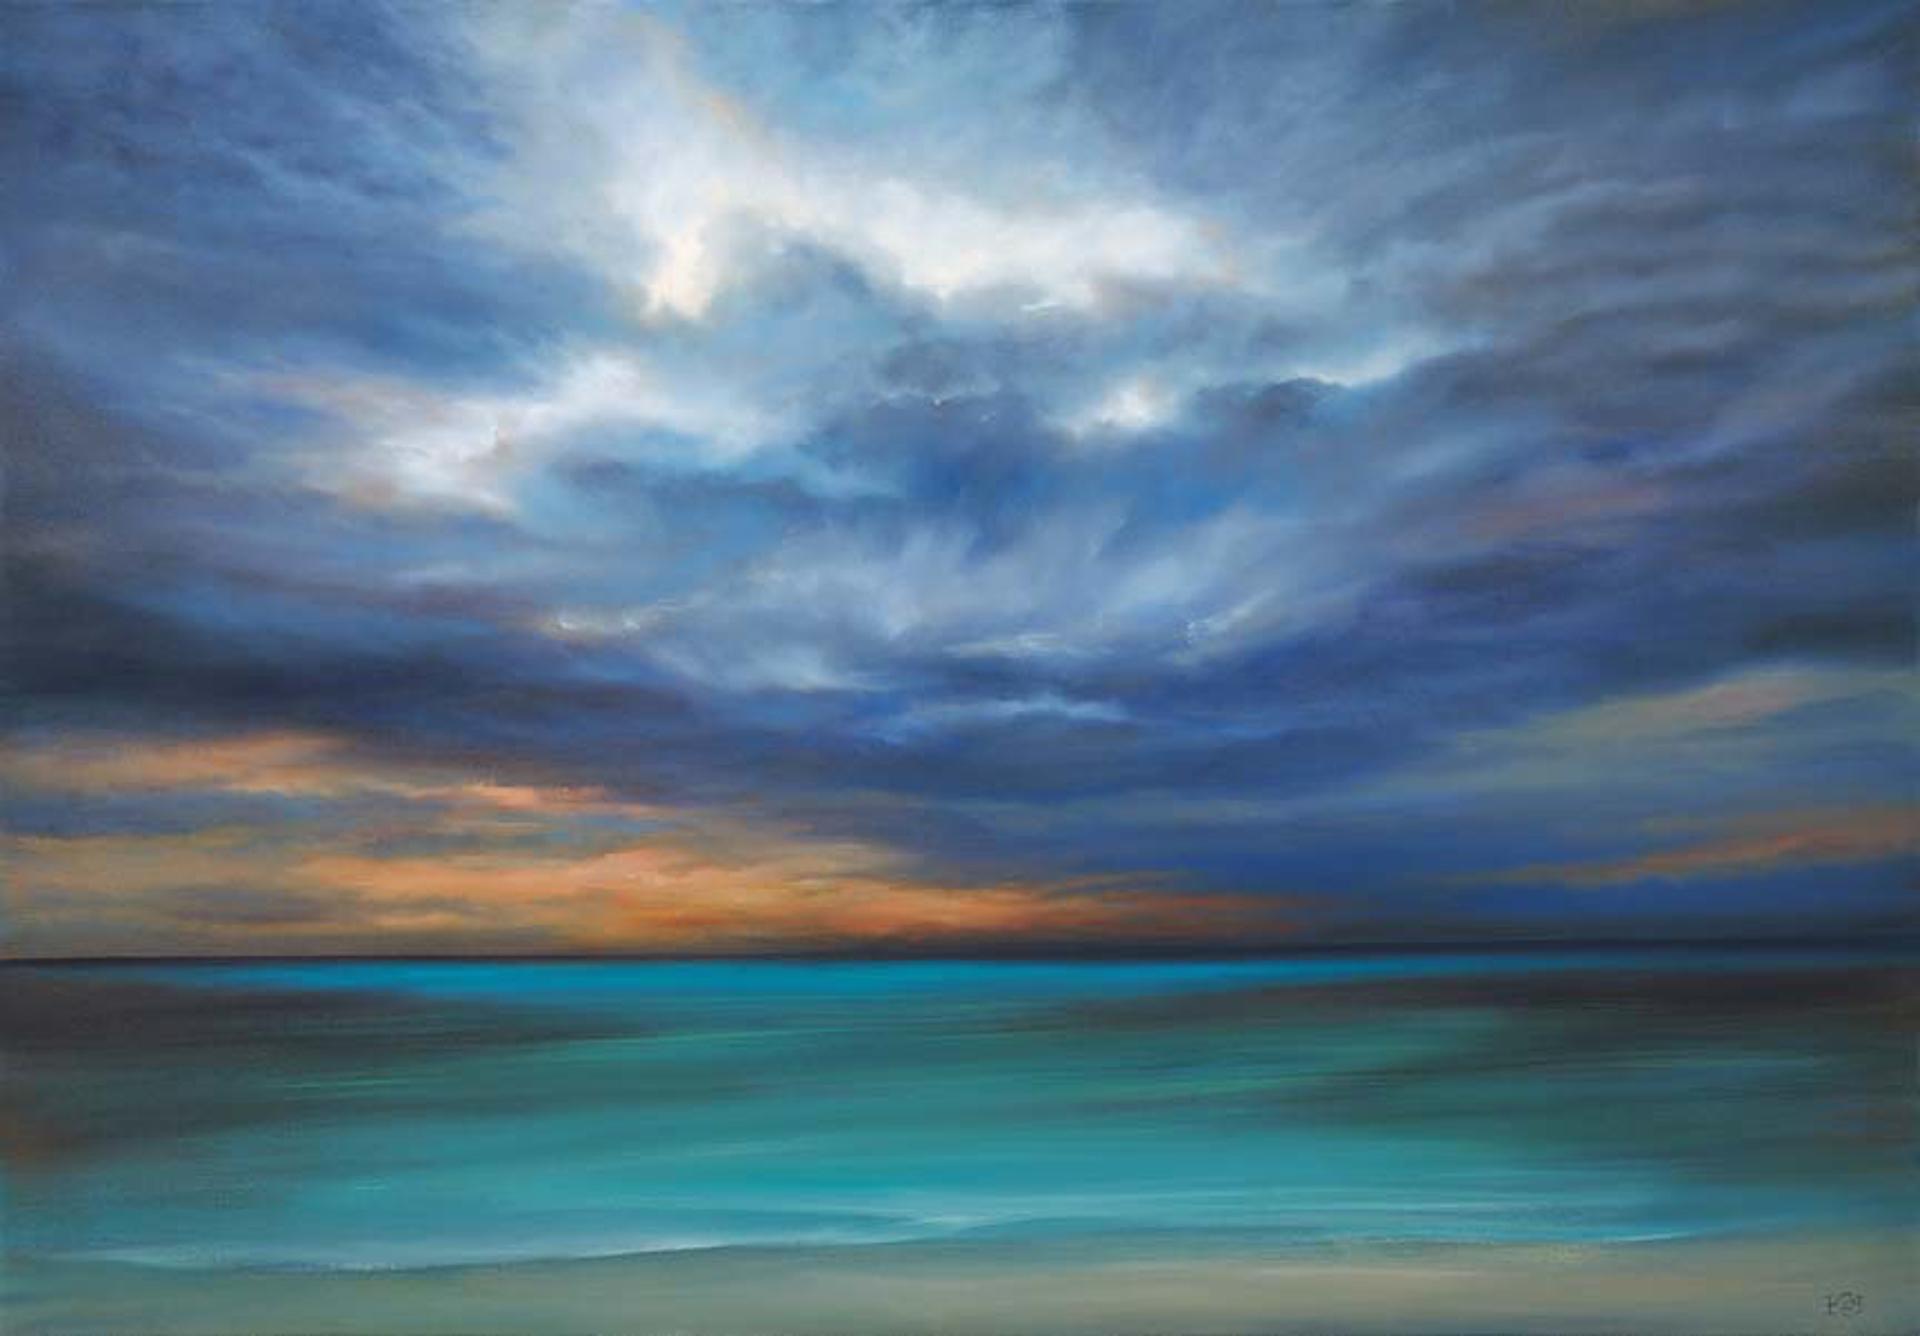 Blue Horizon by Cheryl Kline